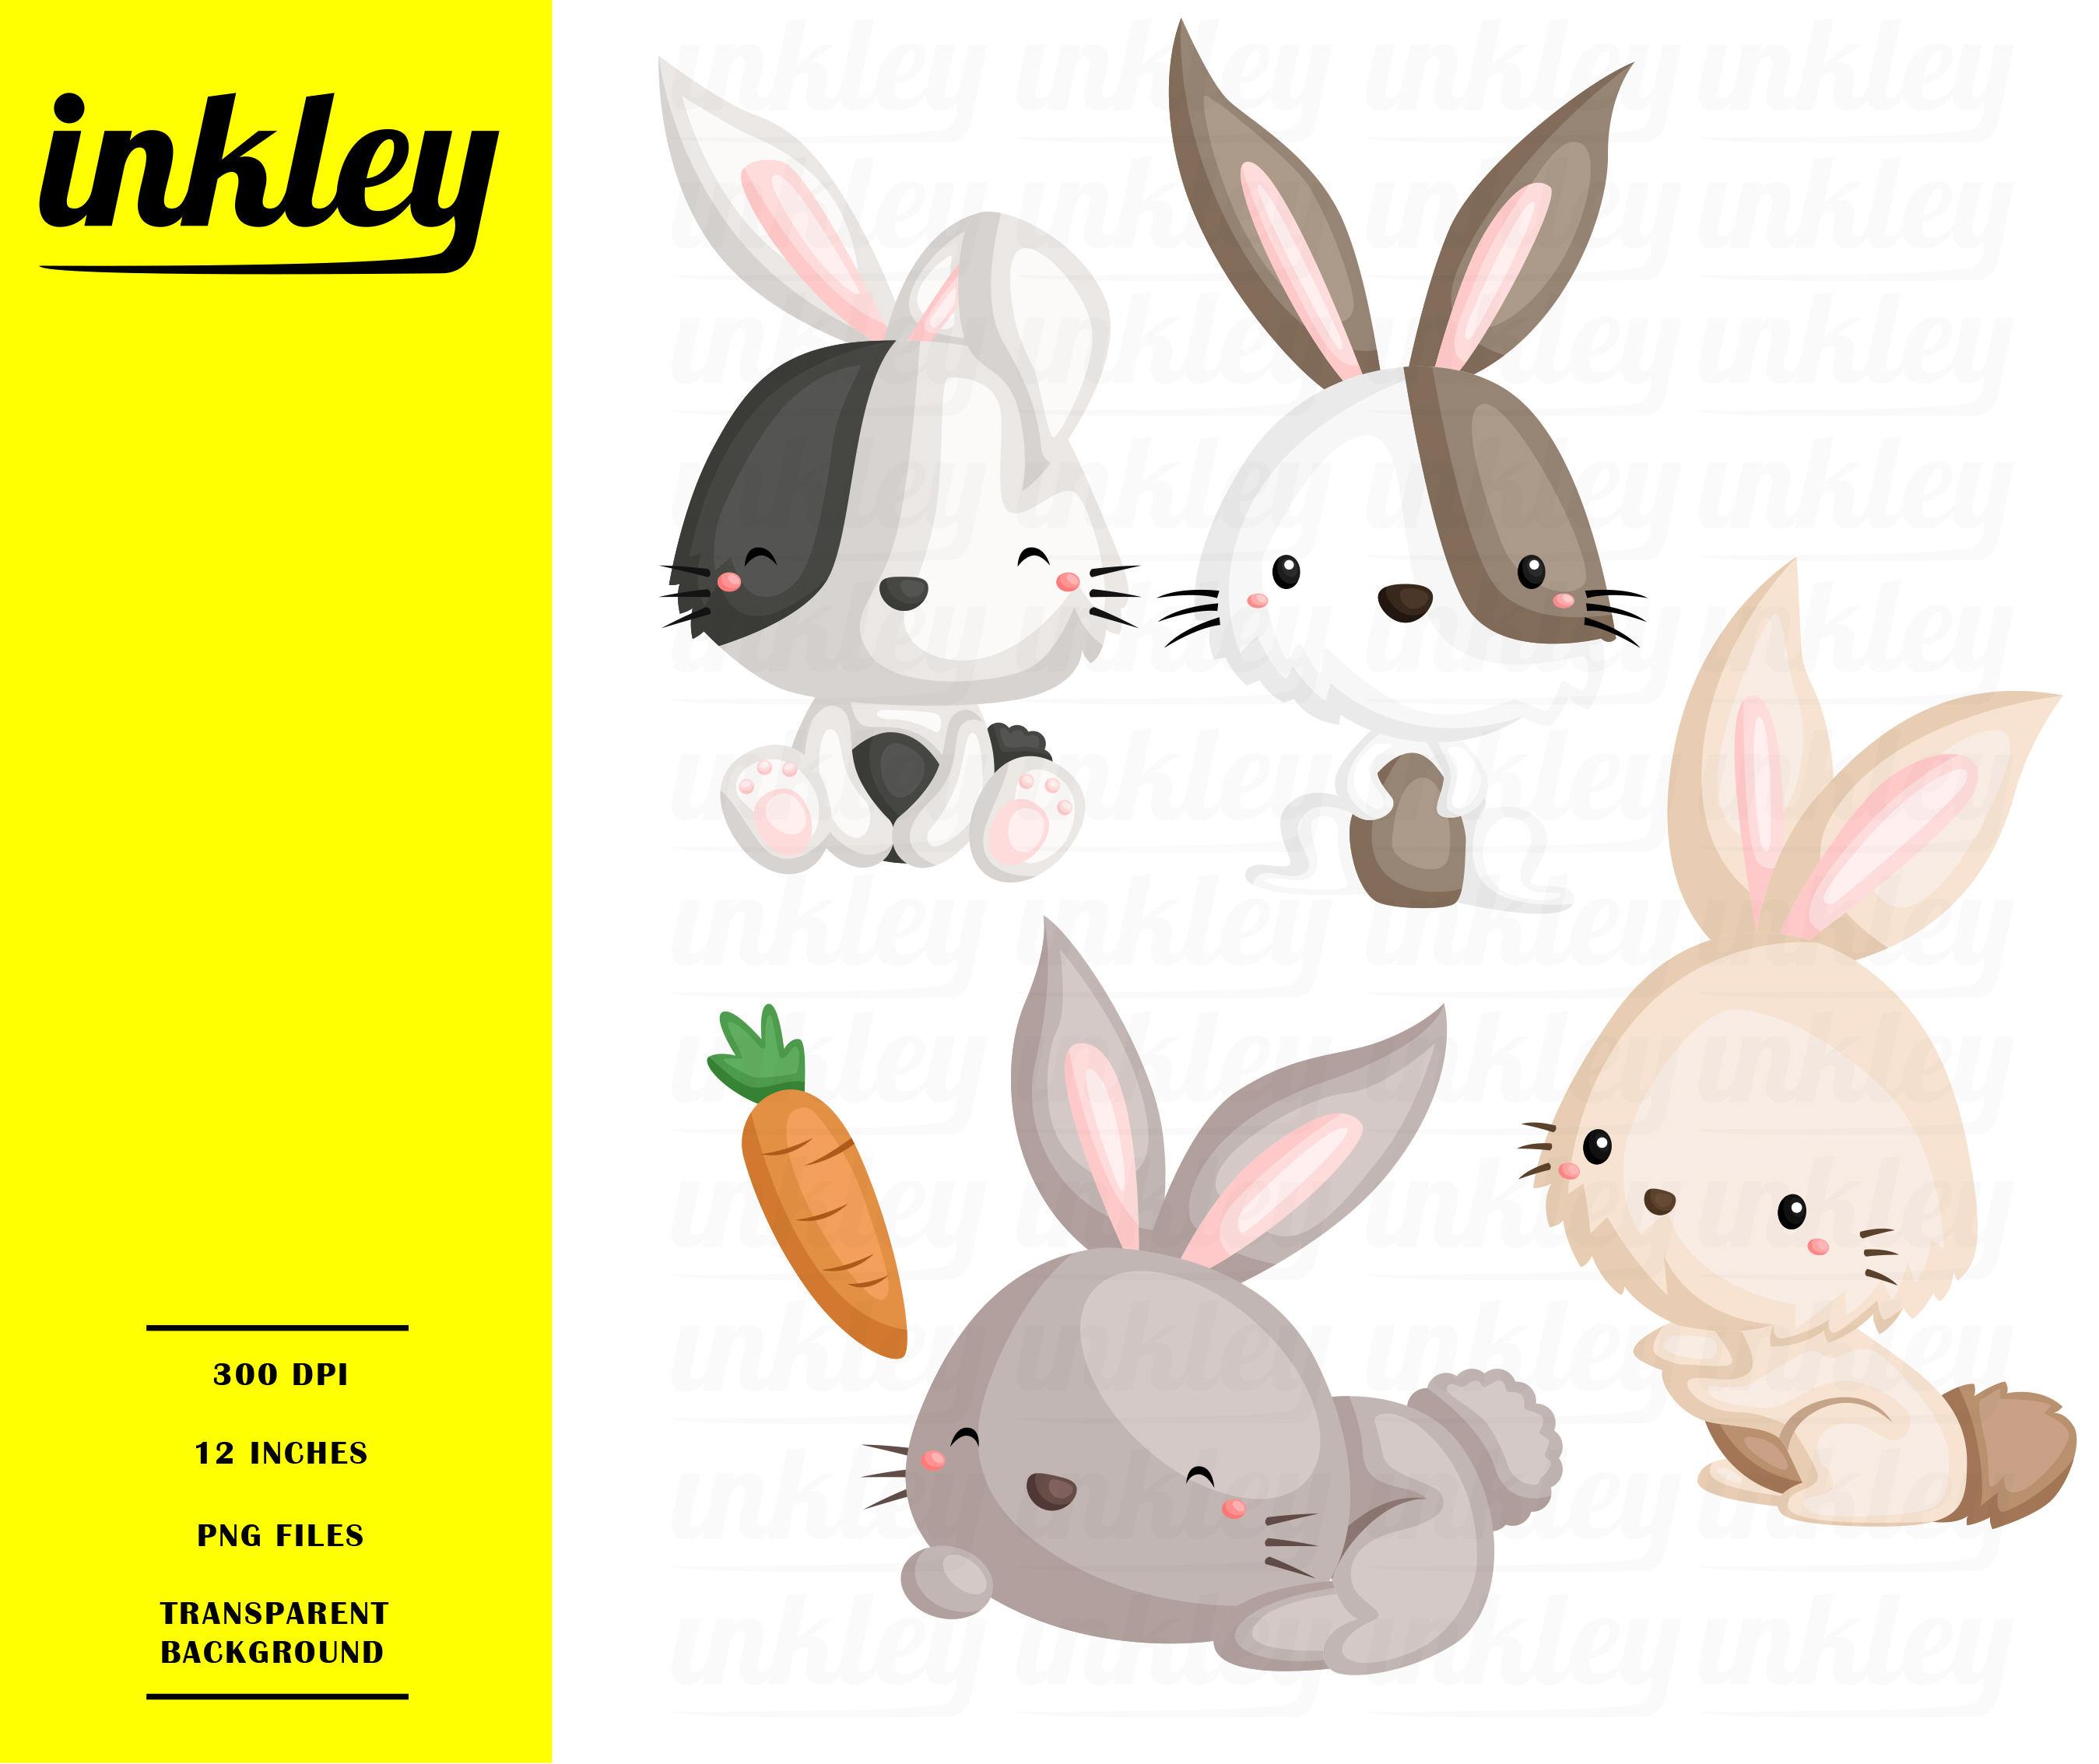 Cute Rabbit Clipart, Cute Rabbit Clip Art, Cute Rabbit Png, Rabbit Carrot  Clipart, Bunny Clipart, Cute Animal Clipart, Vegetable, Mammal.